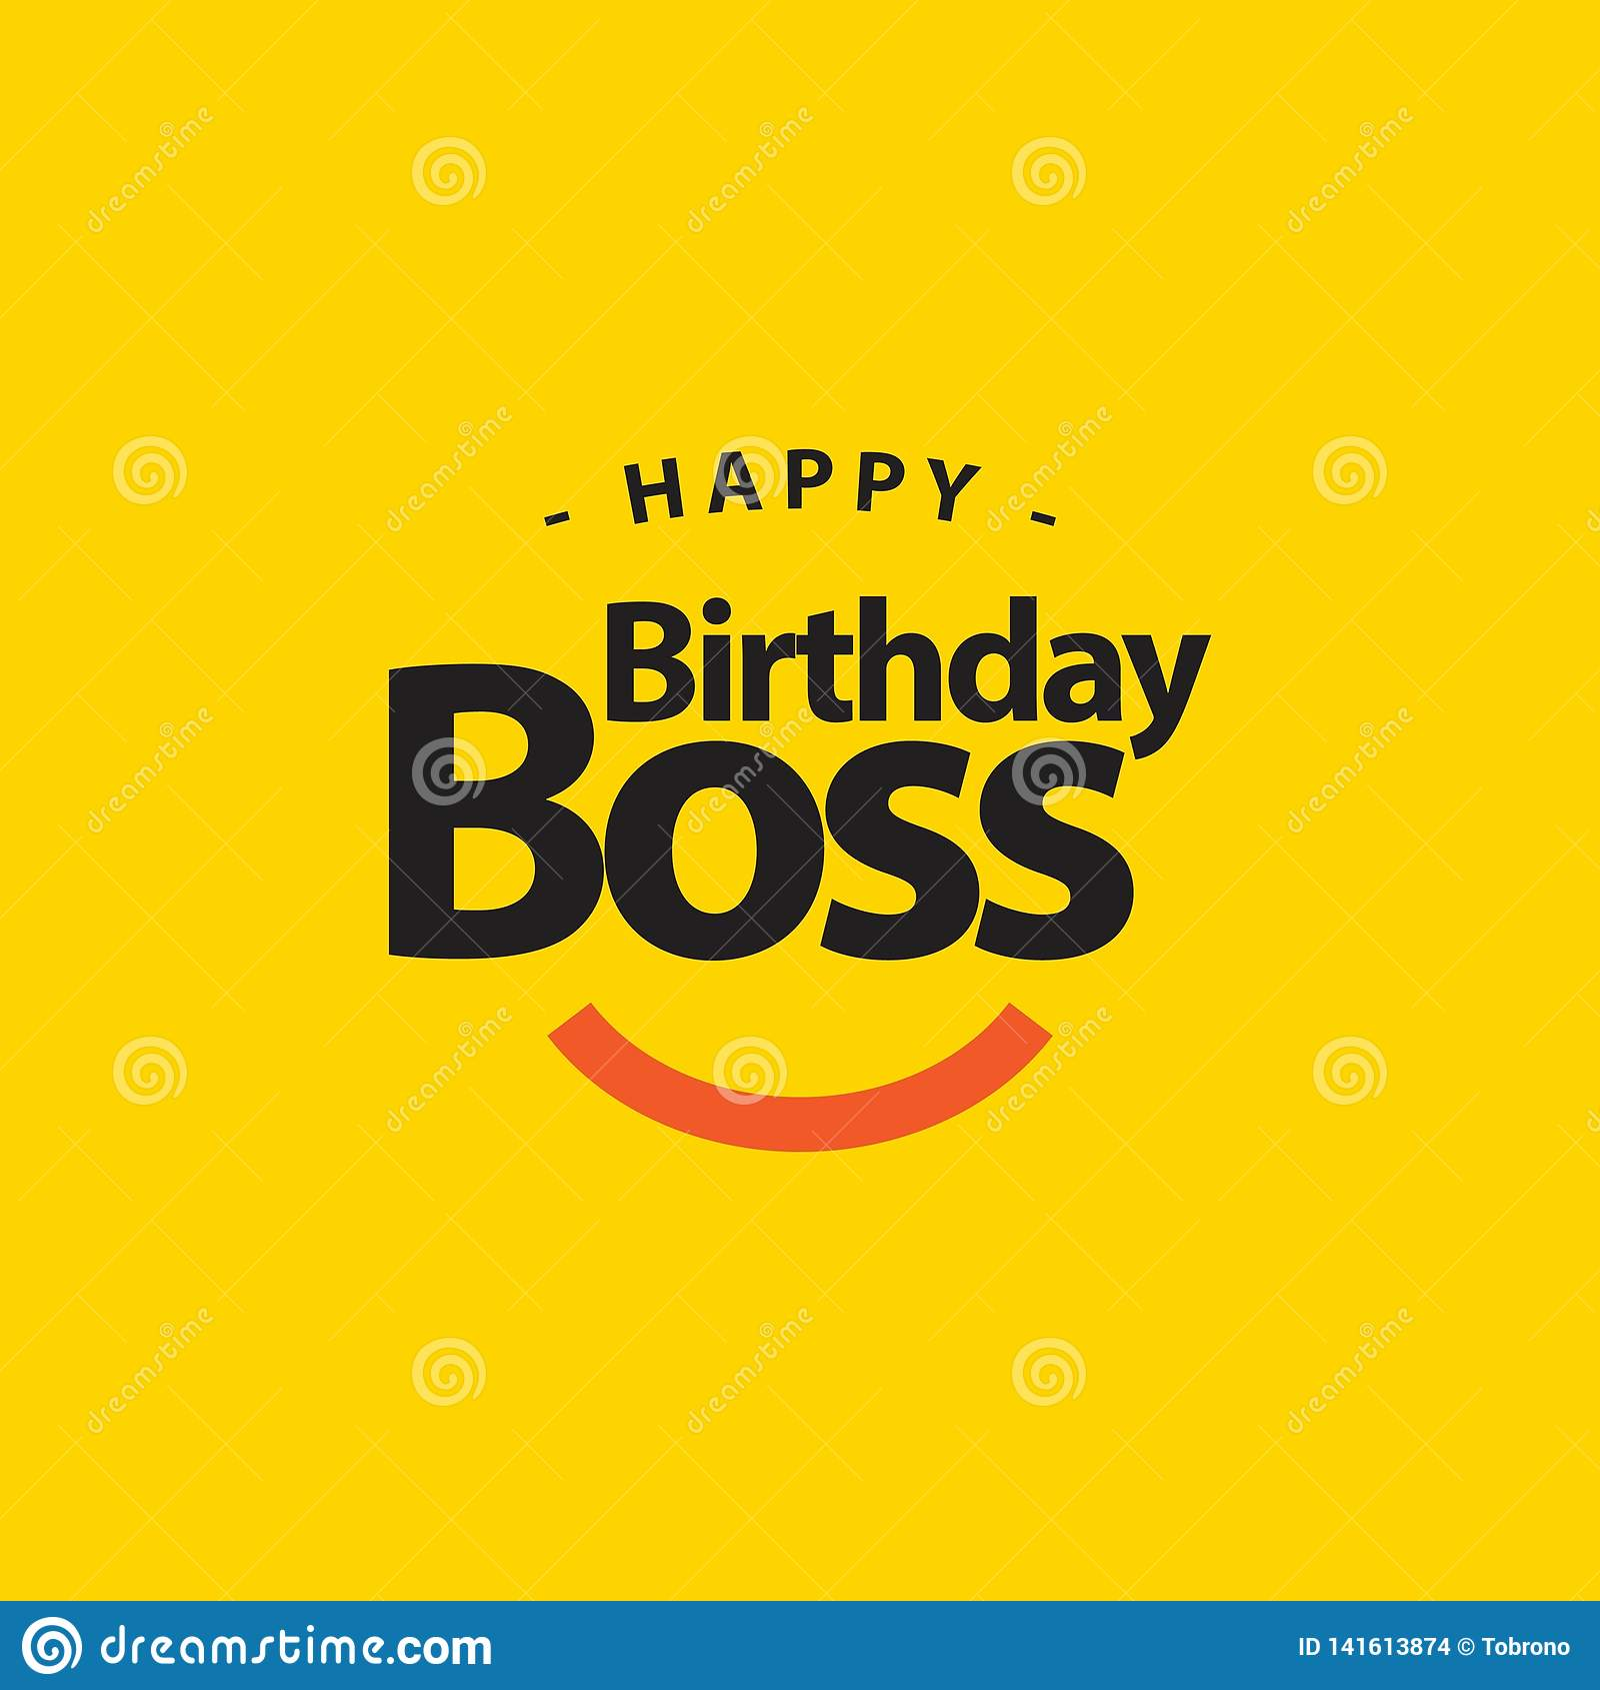 Happy Birthday Boss Vector Template Design Illustration